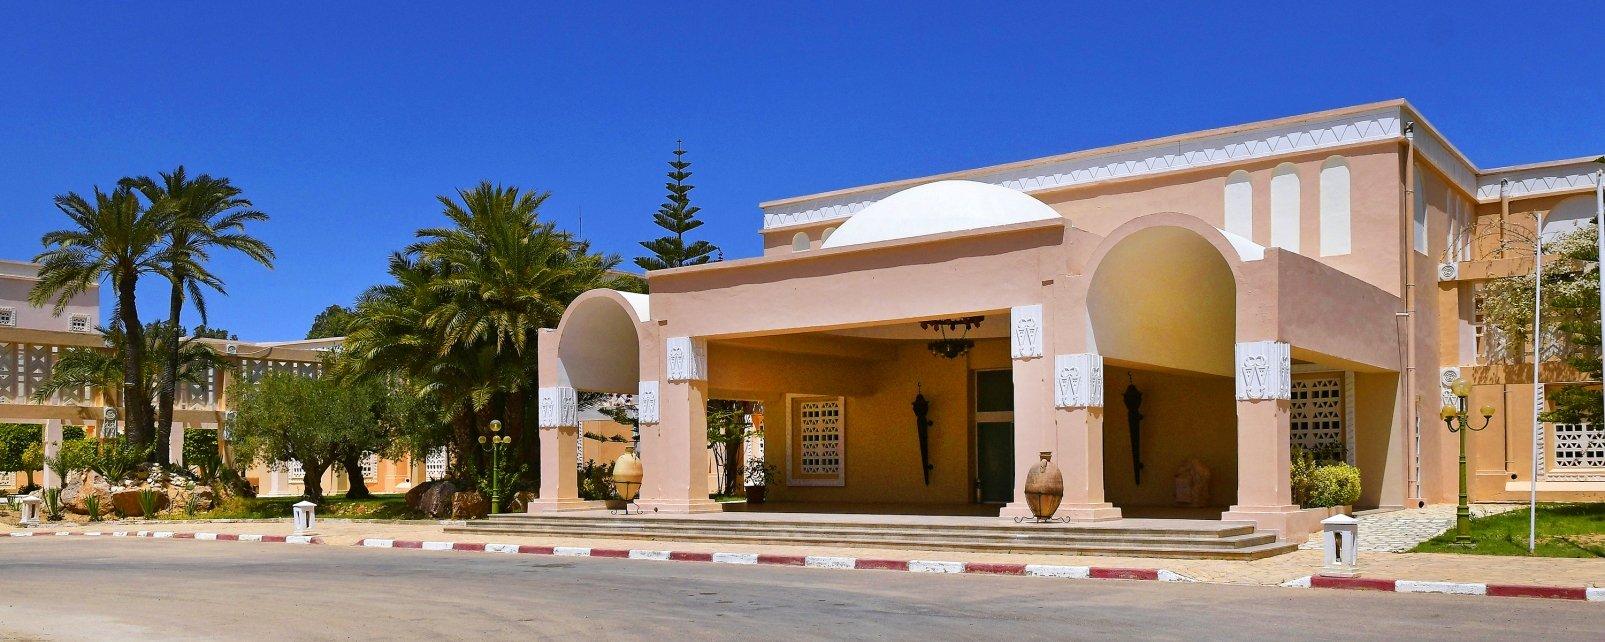 Hôtel Zita Beach